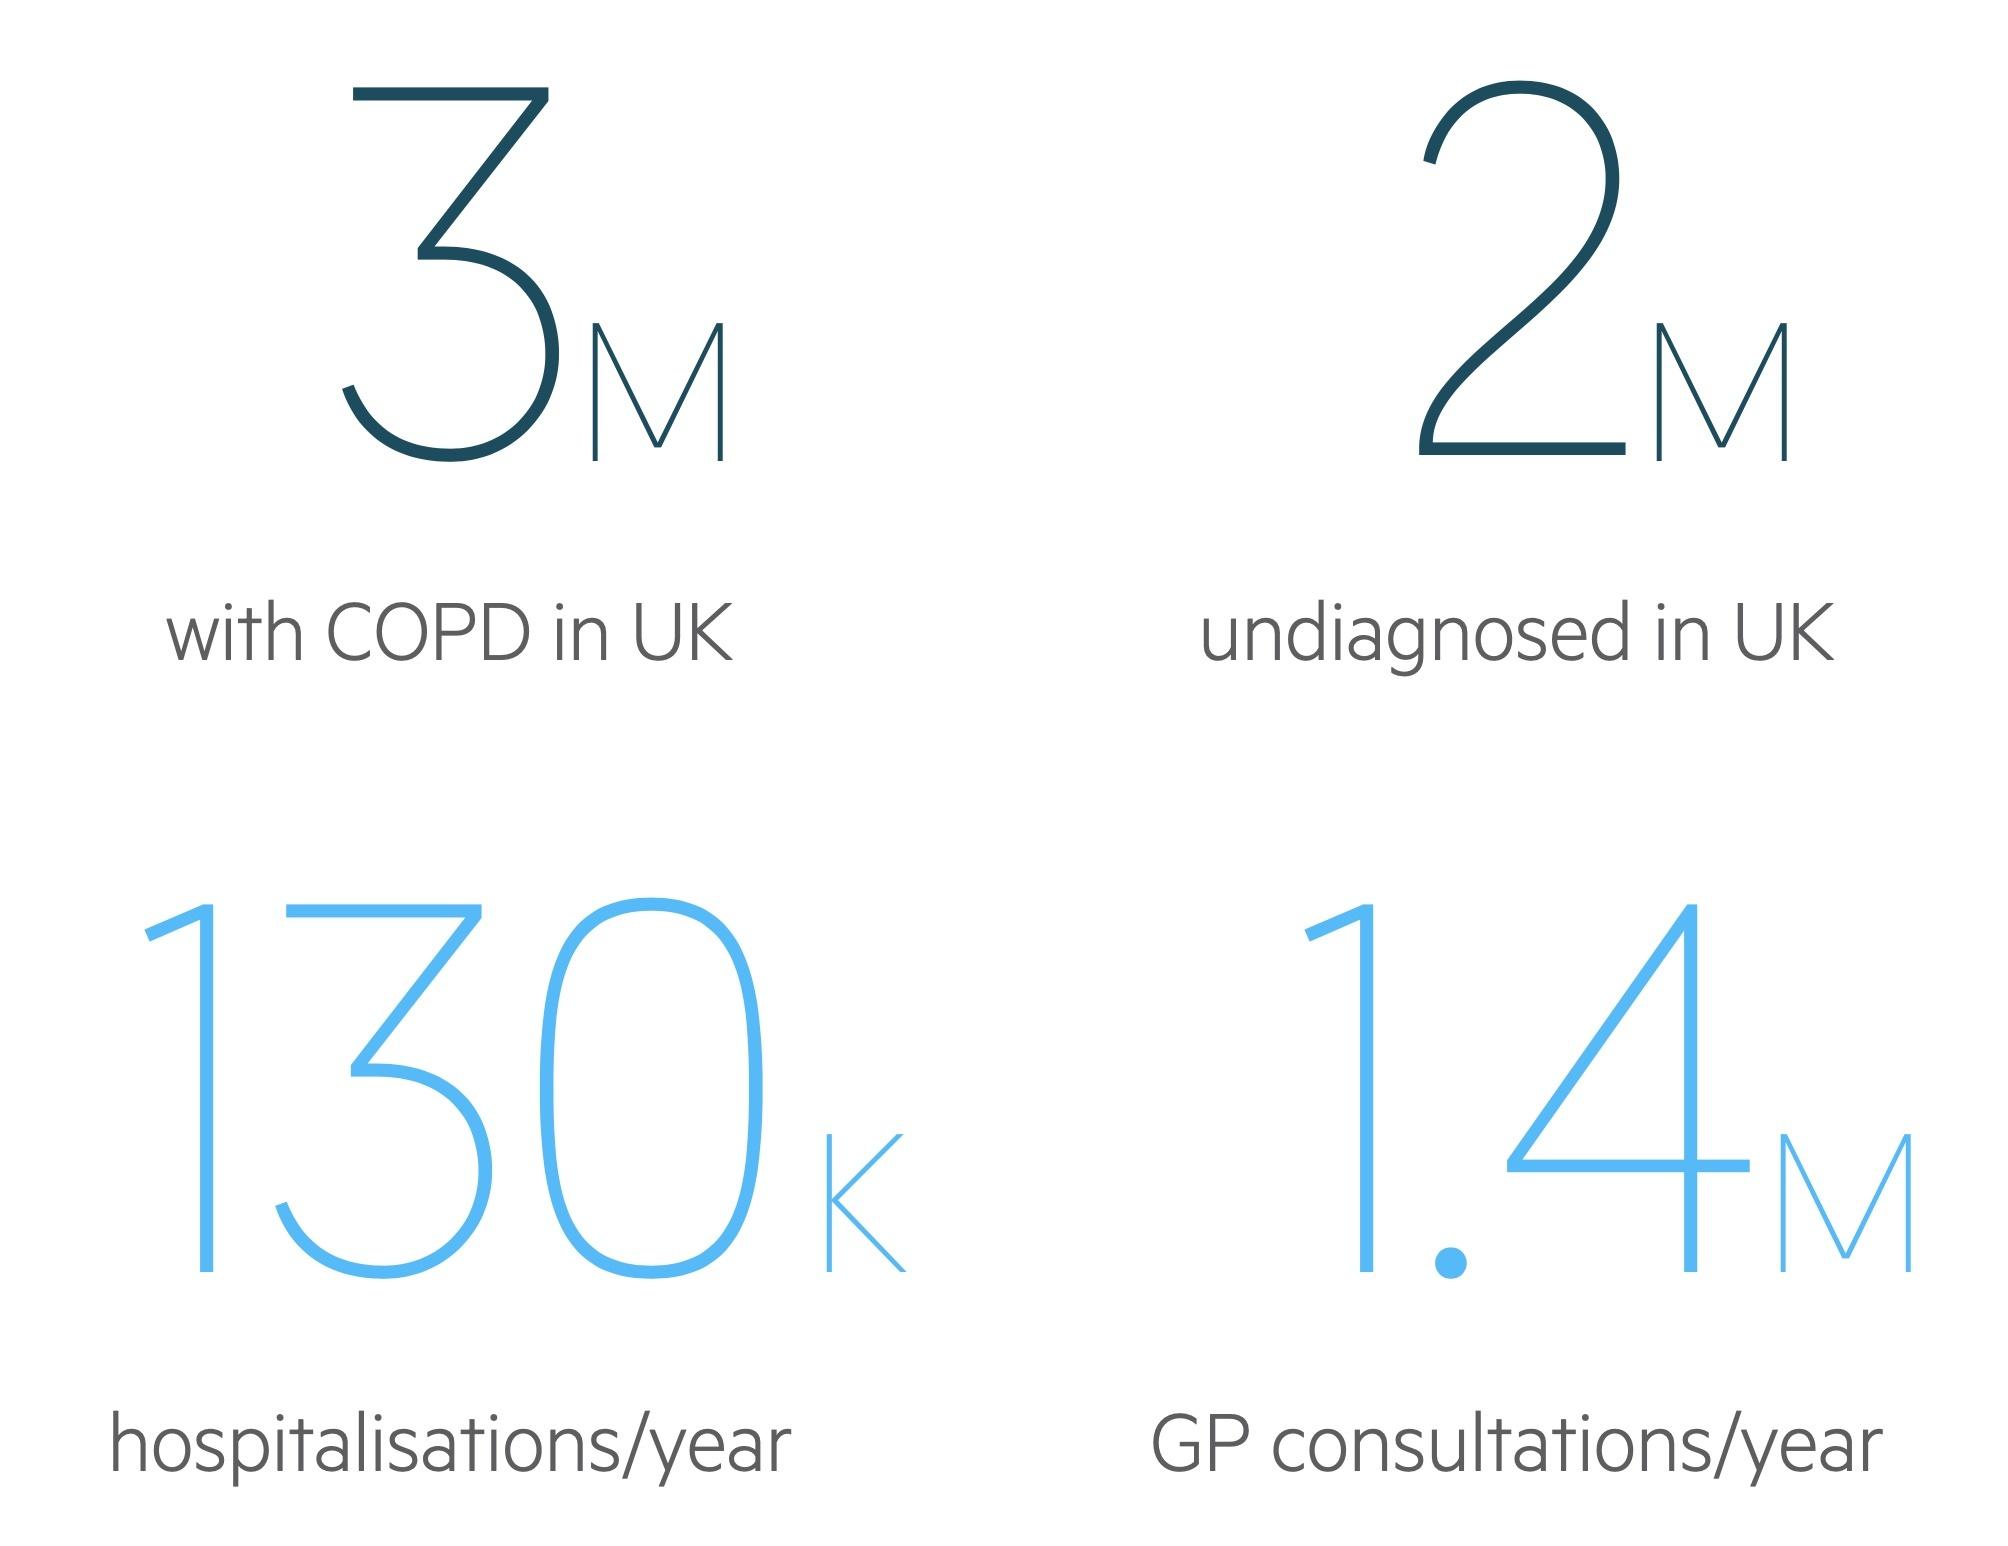 COPD statistics